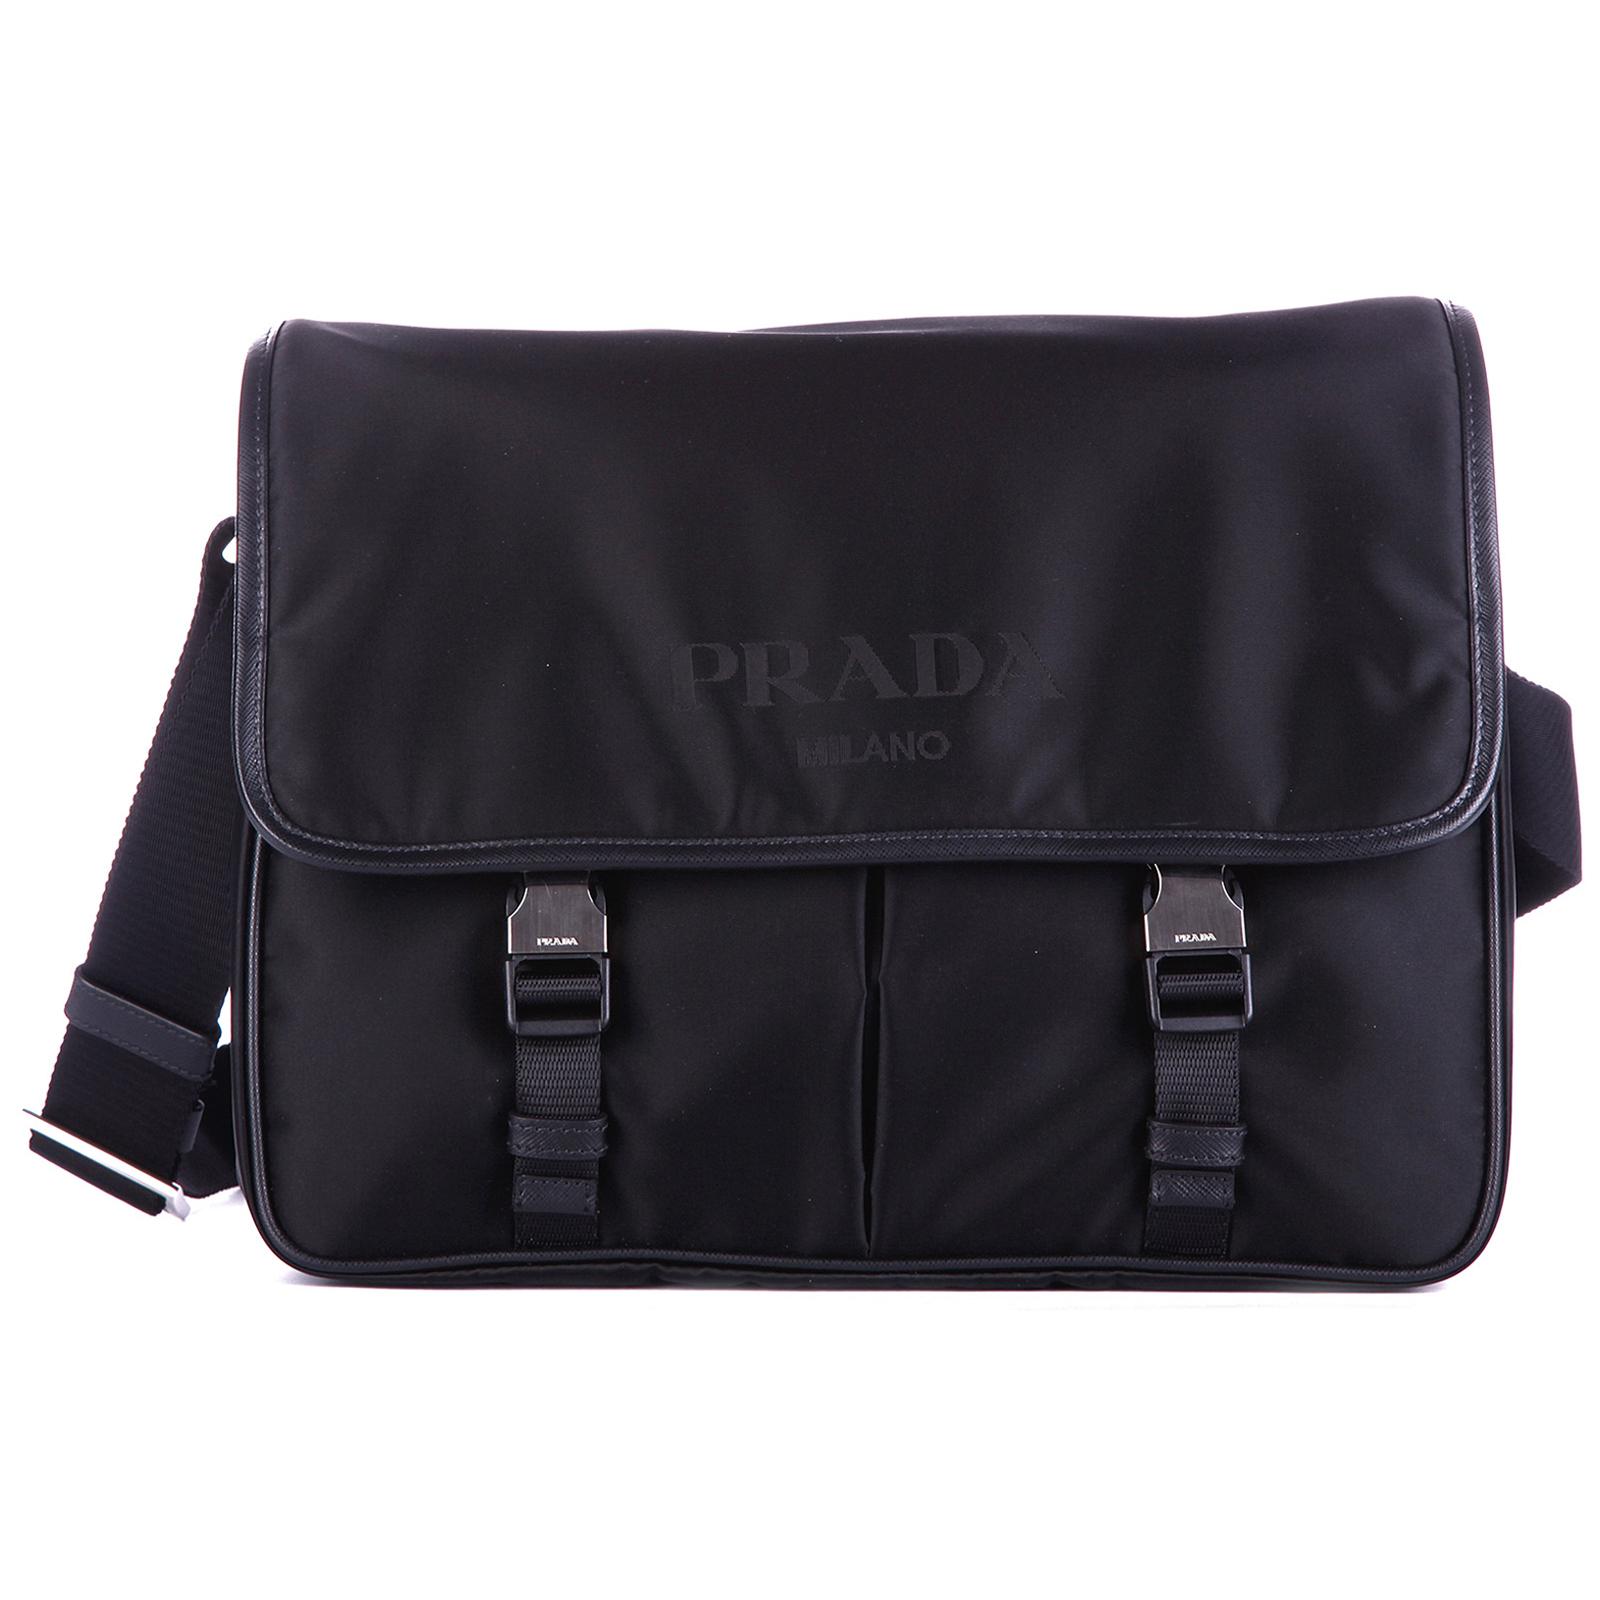 a3d9d0e7f561 Prada Men s nylon cross-body messenger shoulder bag